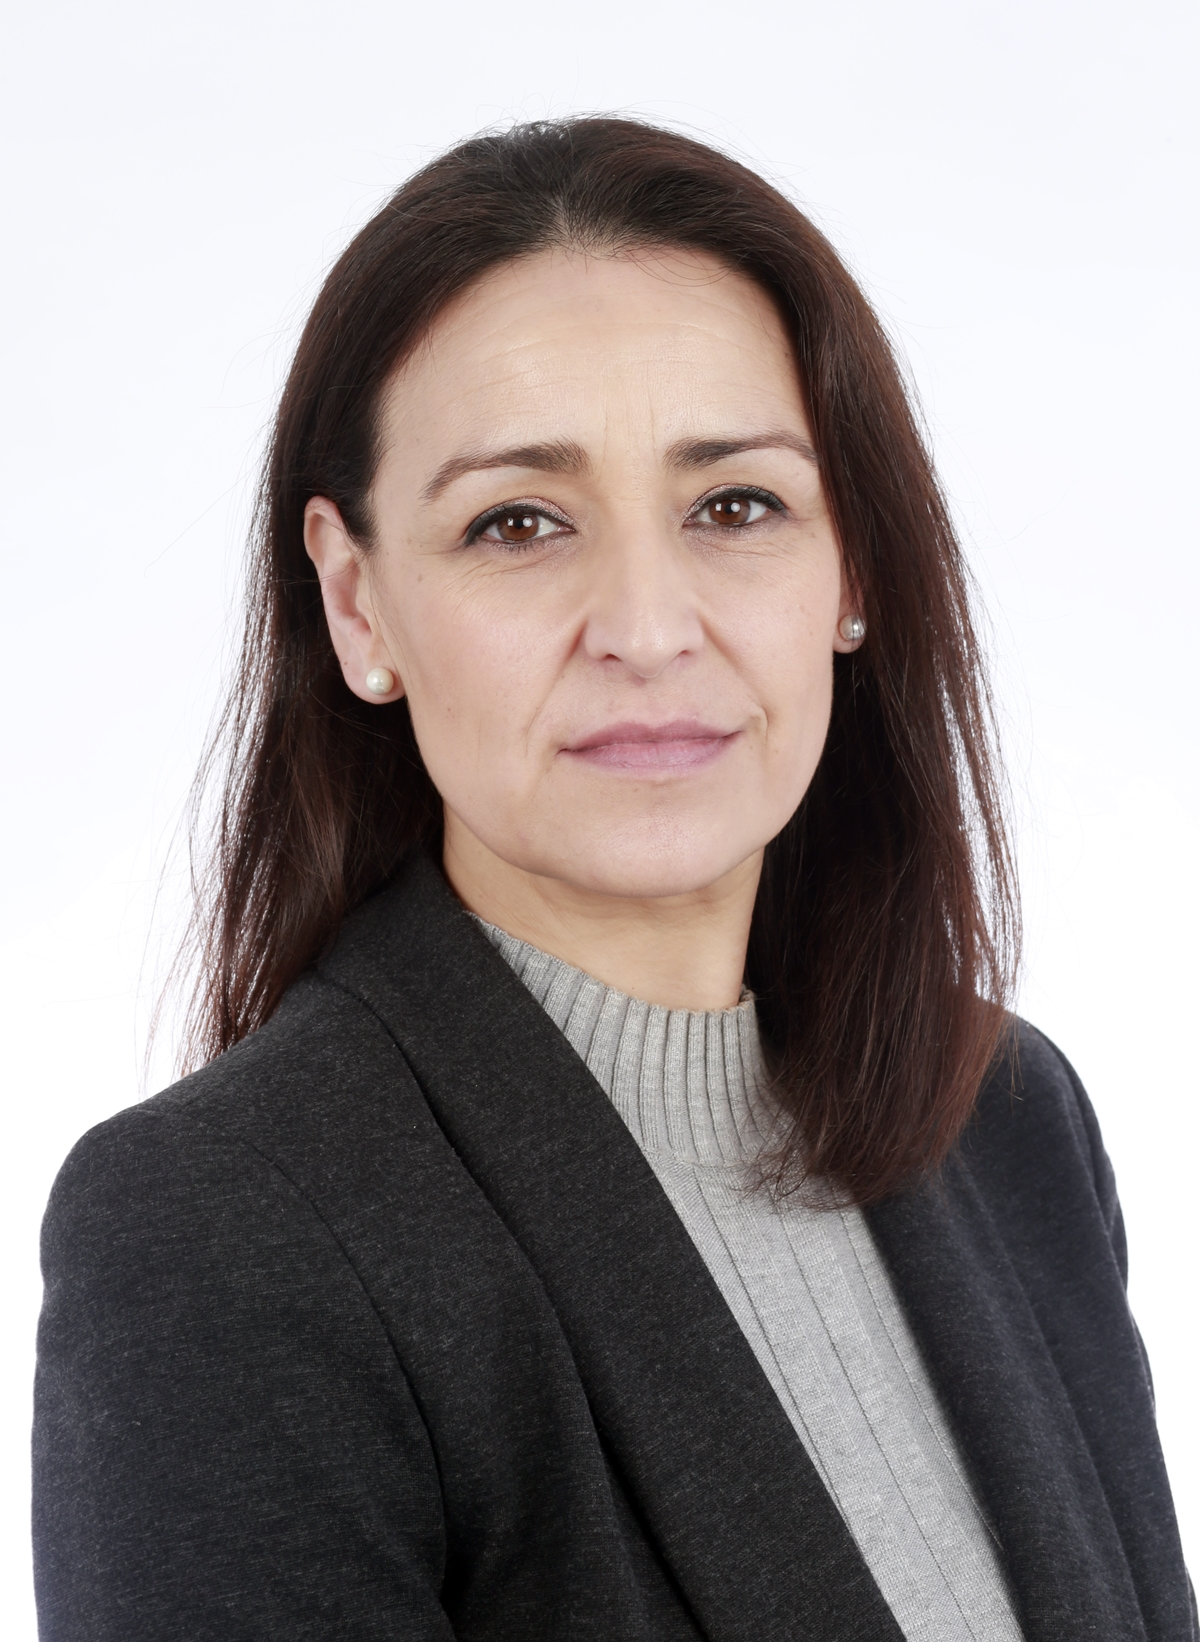 Emilia Díaz Asensio Muñoz